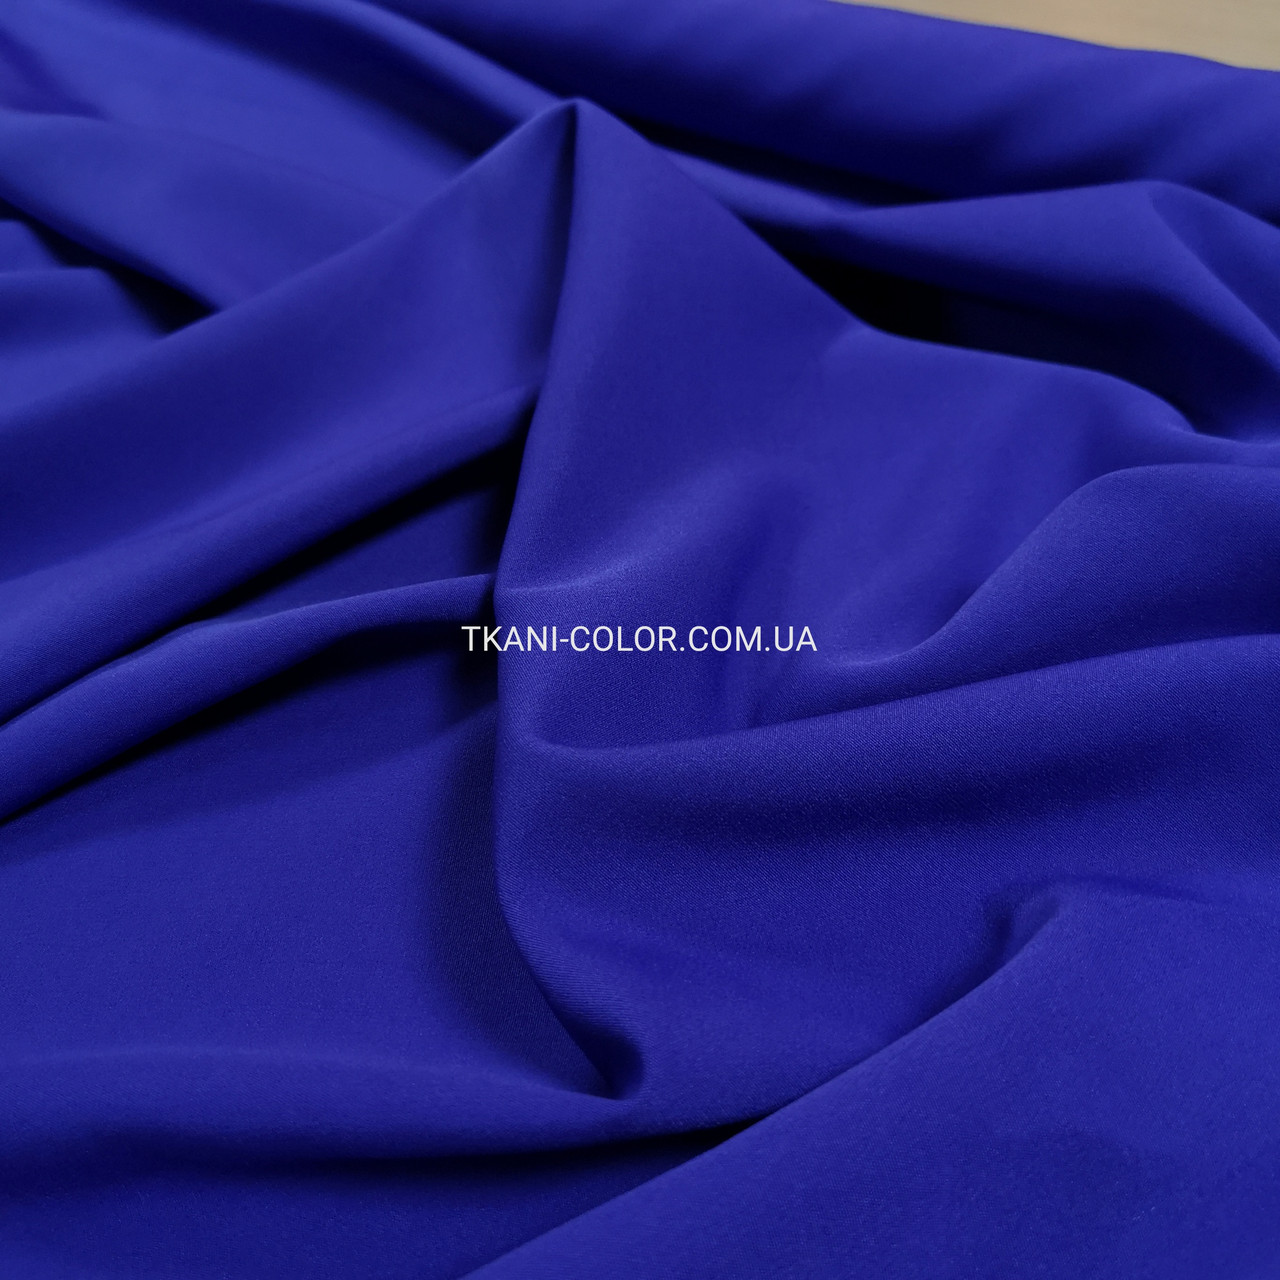 Костюмная ткань креп барби синий электрик